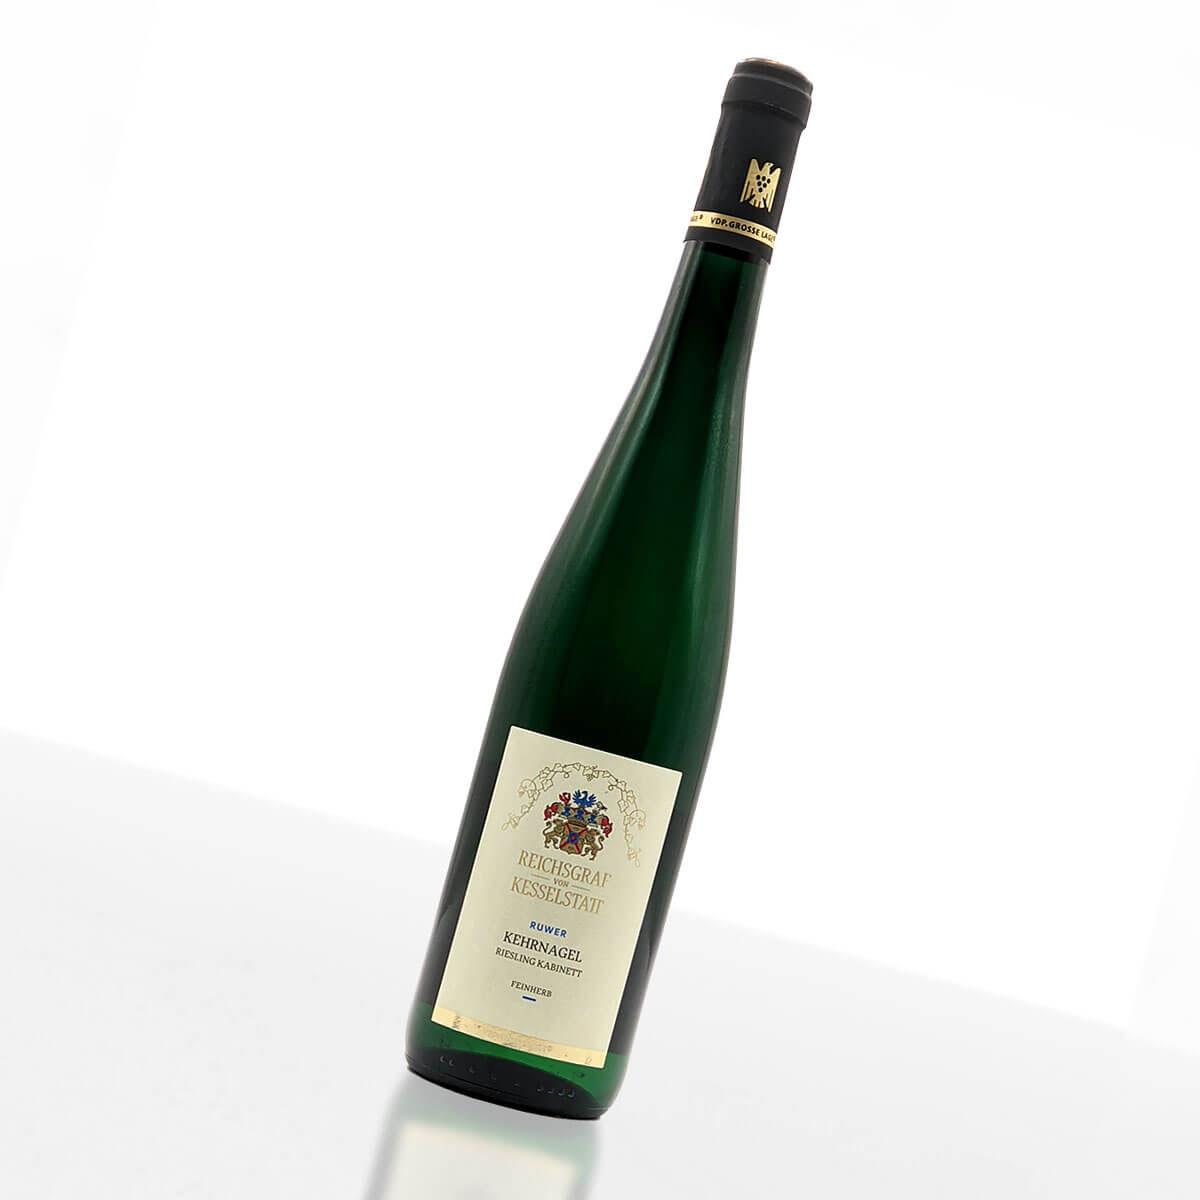 2019er Kaseler Kehrnagel Riesling Kabinett feinherb • Weingut Reichsgraf von Kesselstatt